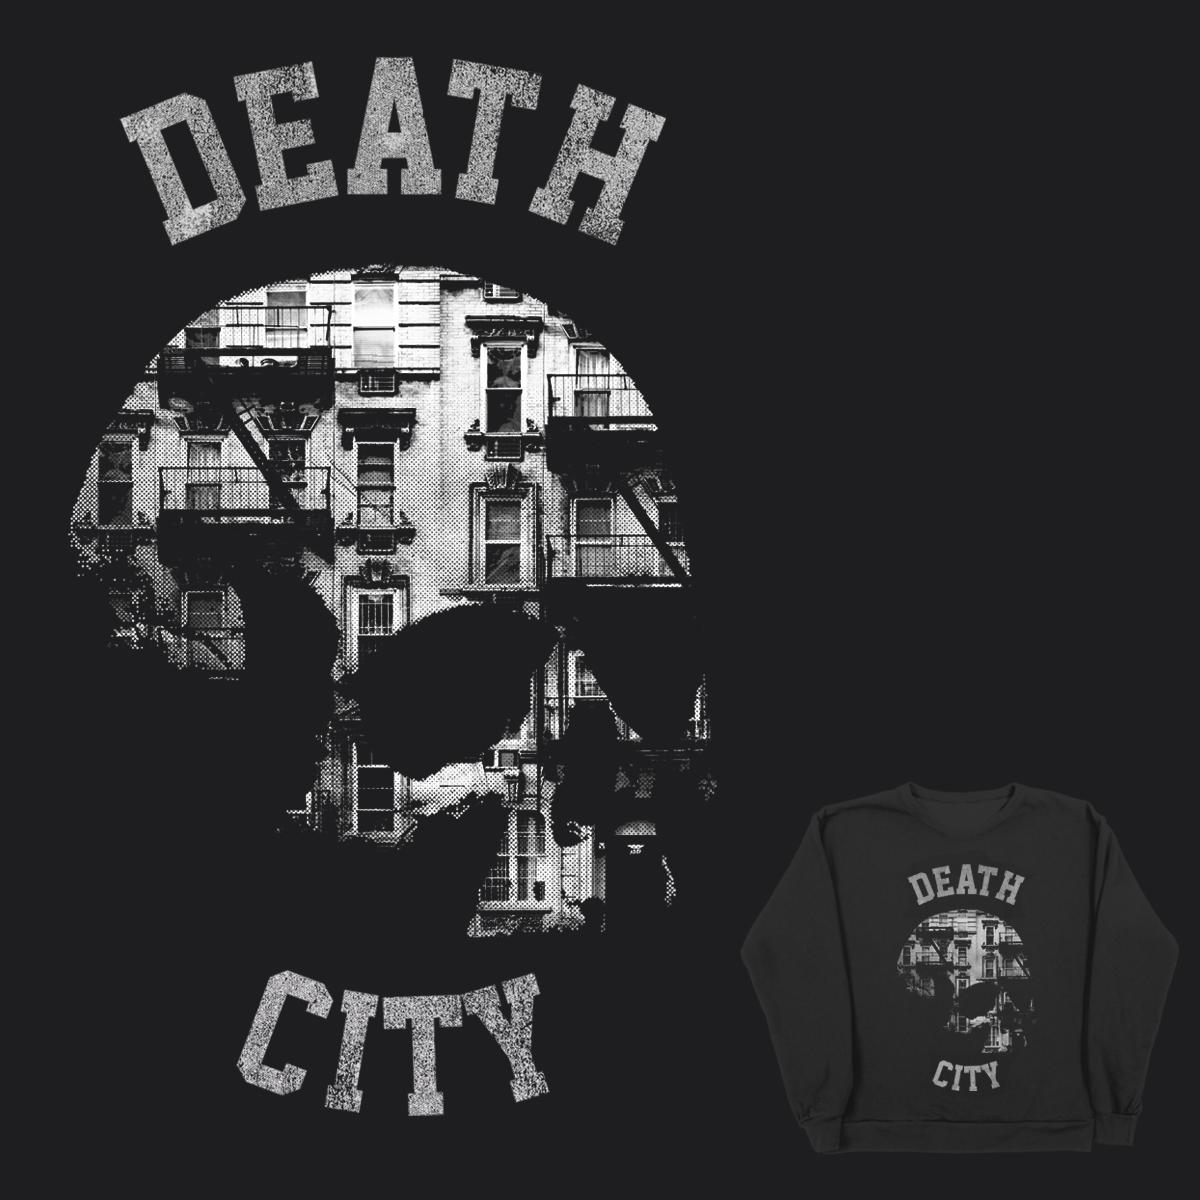 Death City by admrjcvch on Threadless